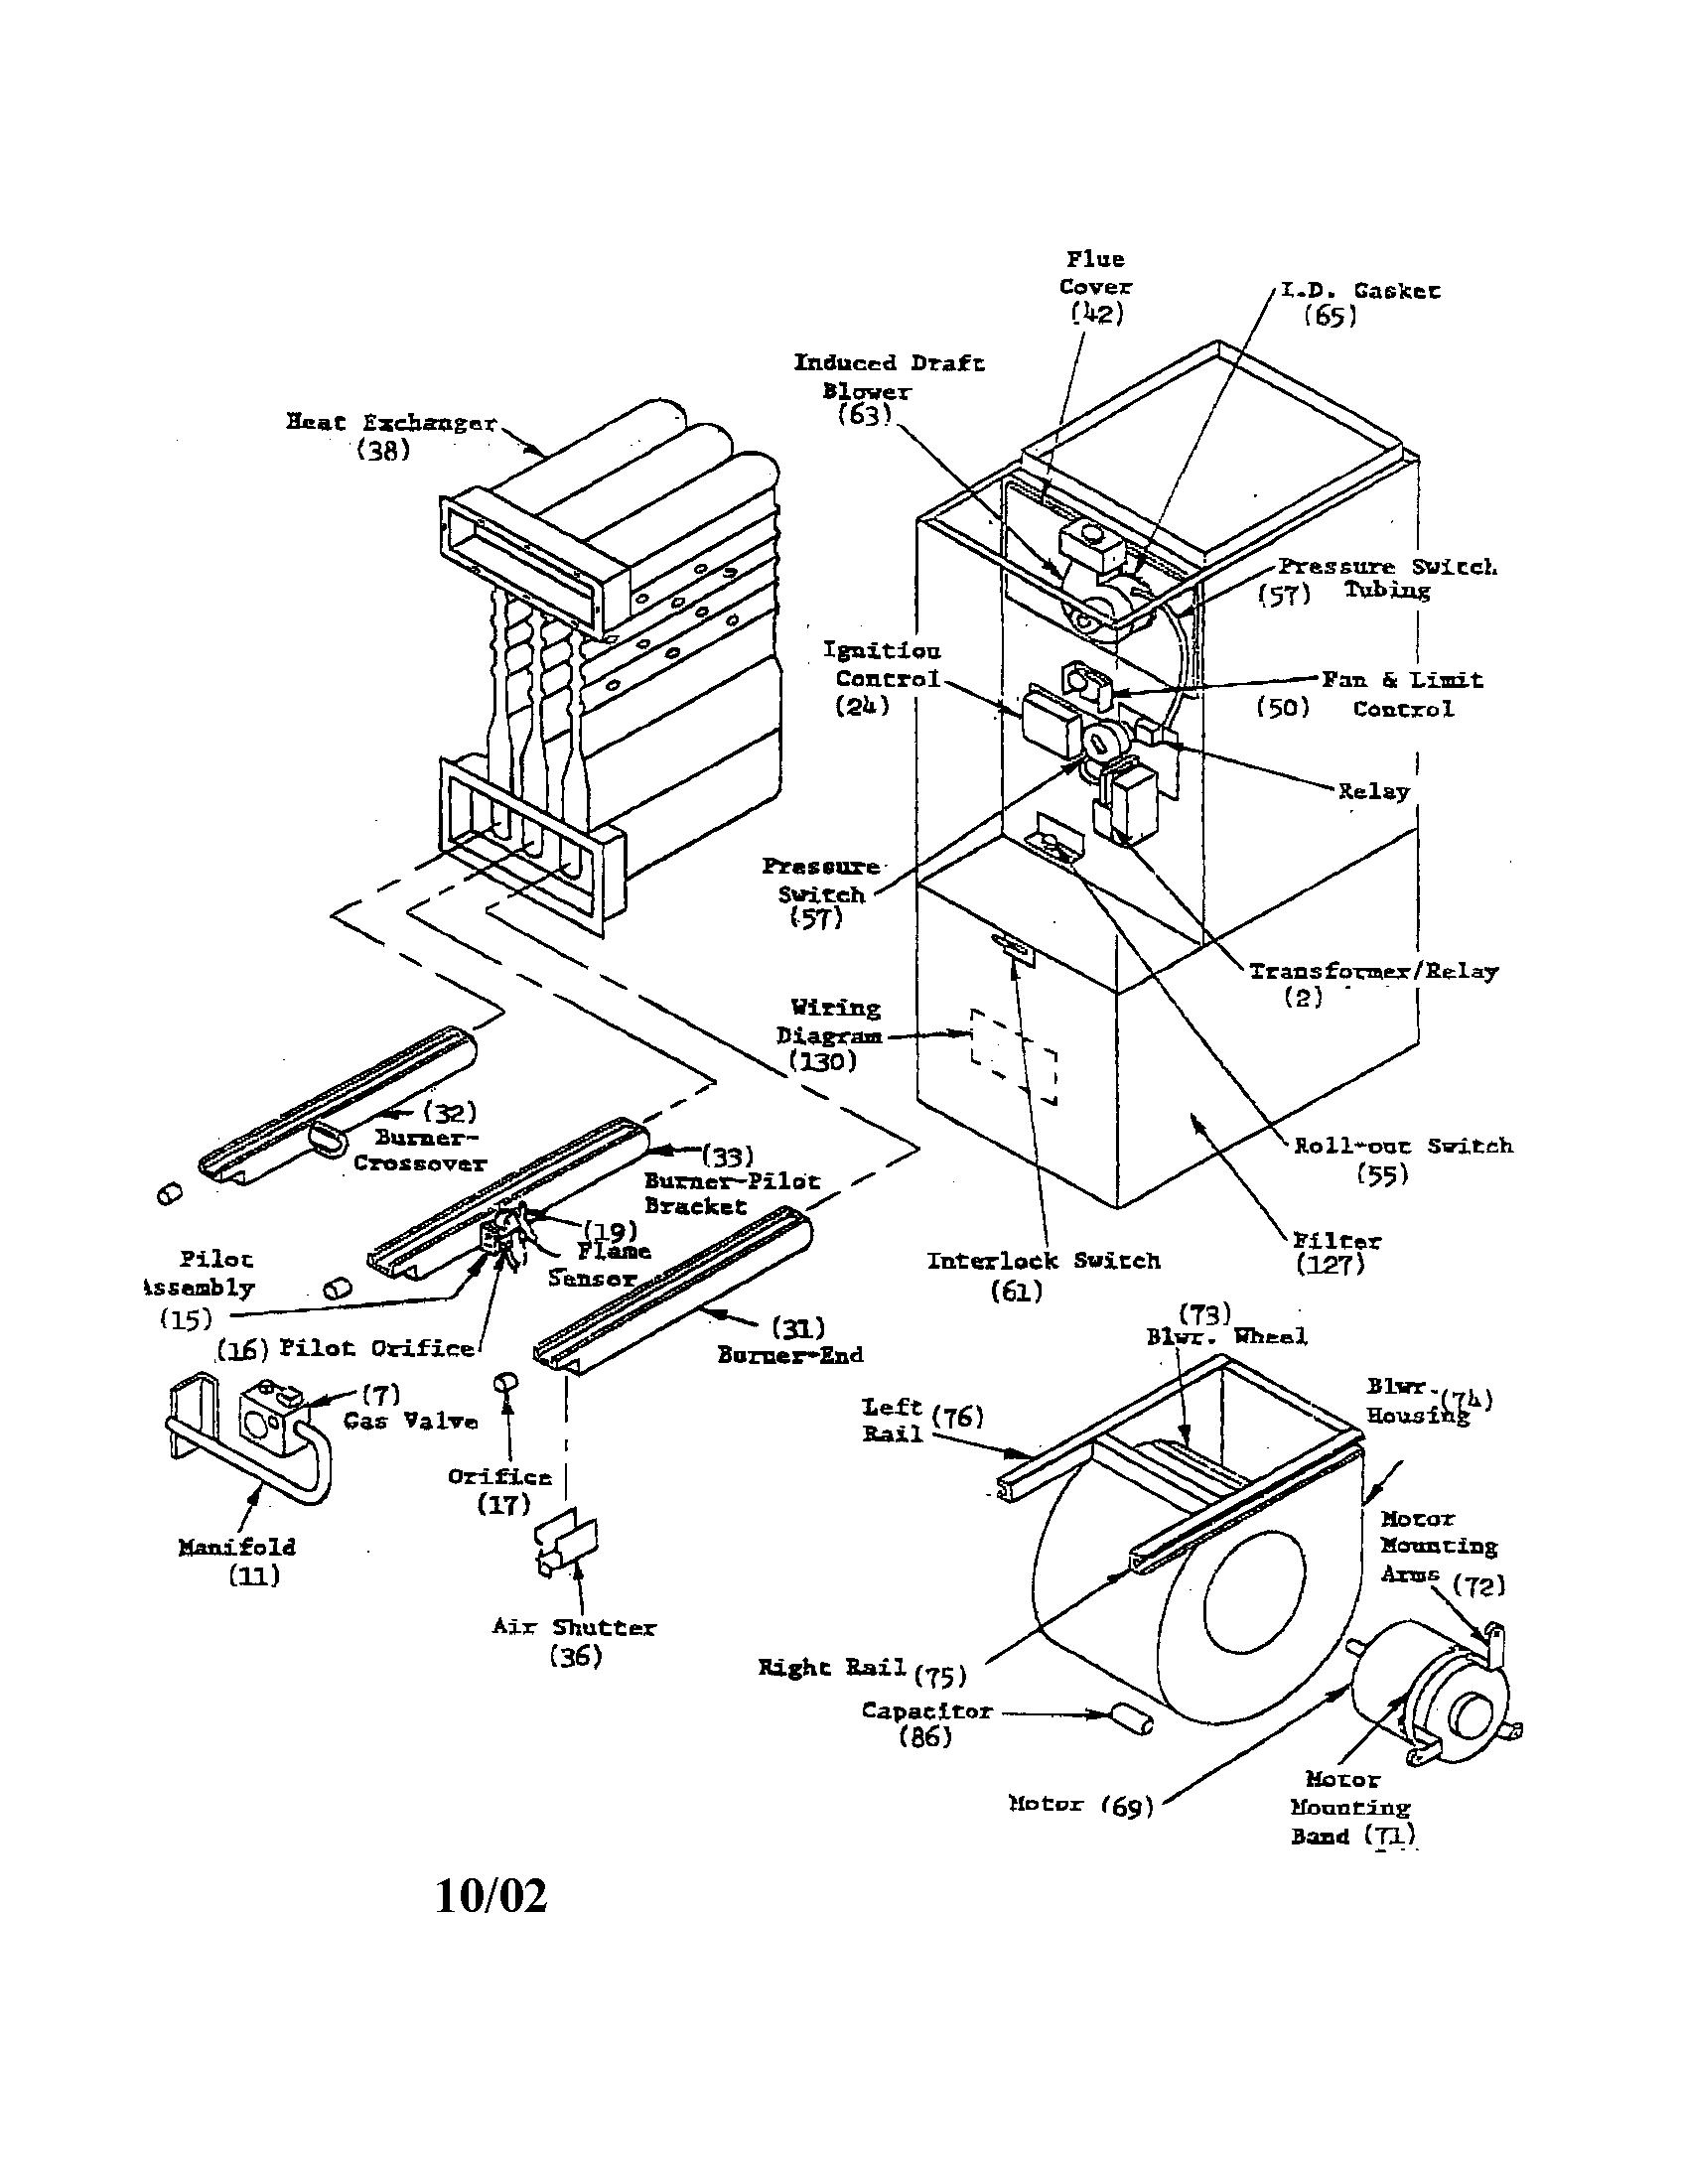 wiring diagram carrier 3 1 2 ton air handler